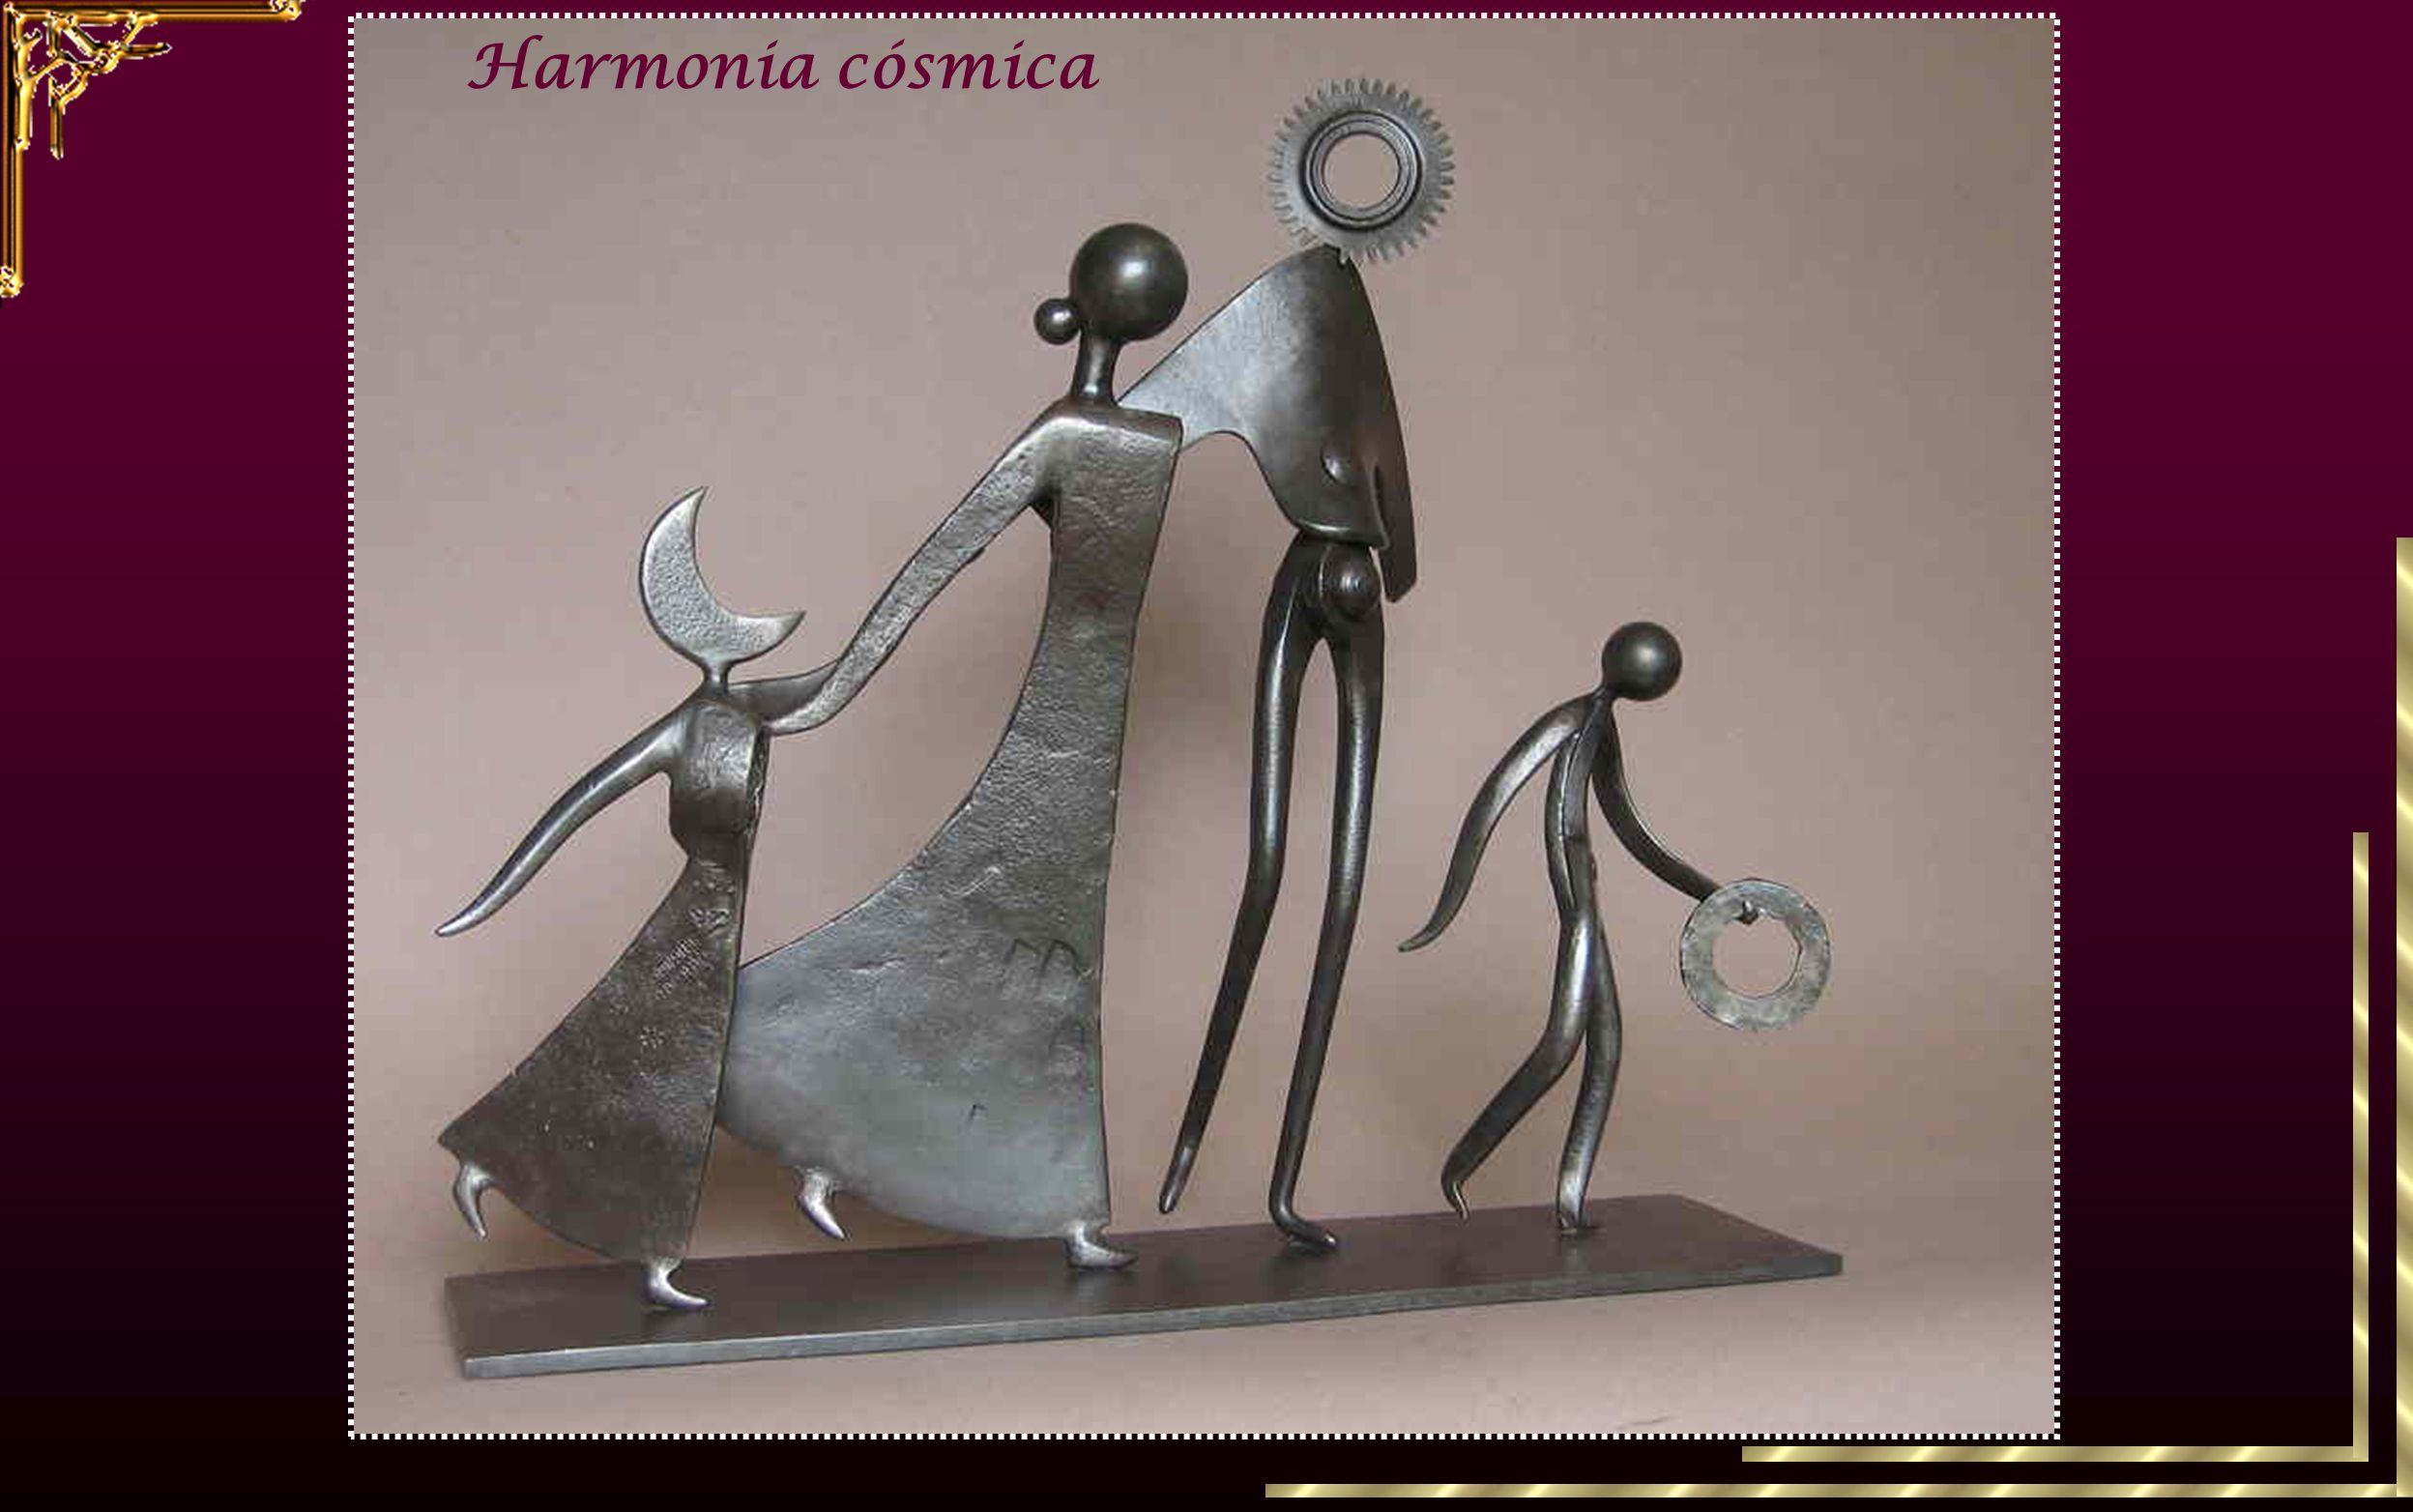 Harmonia cósmica